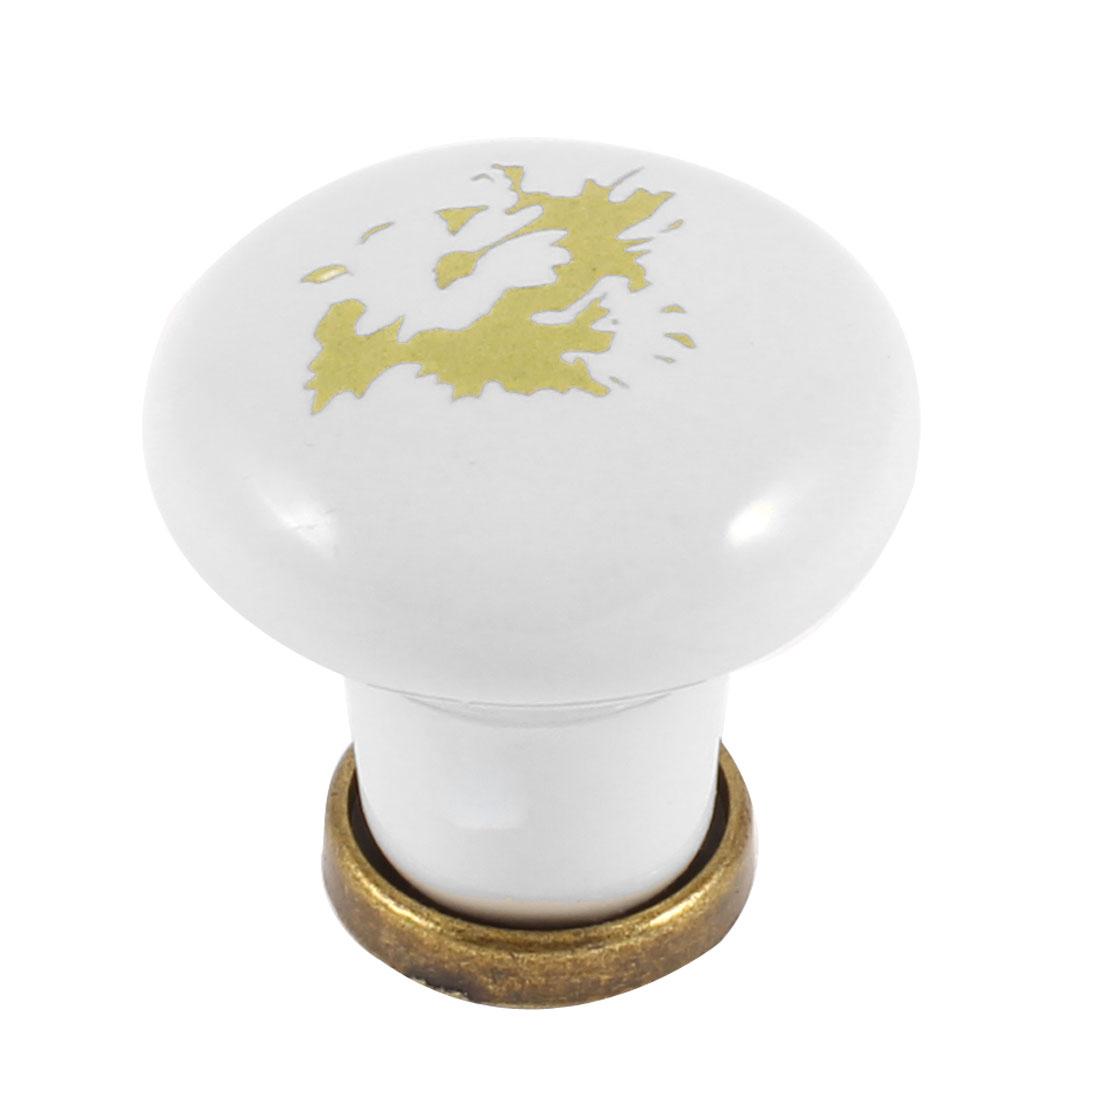 Home Ceramic Round Shaped Cabinet Drawer Handle Pull Knob White Bronze Tone